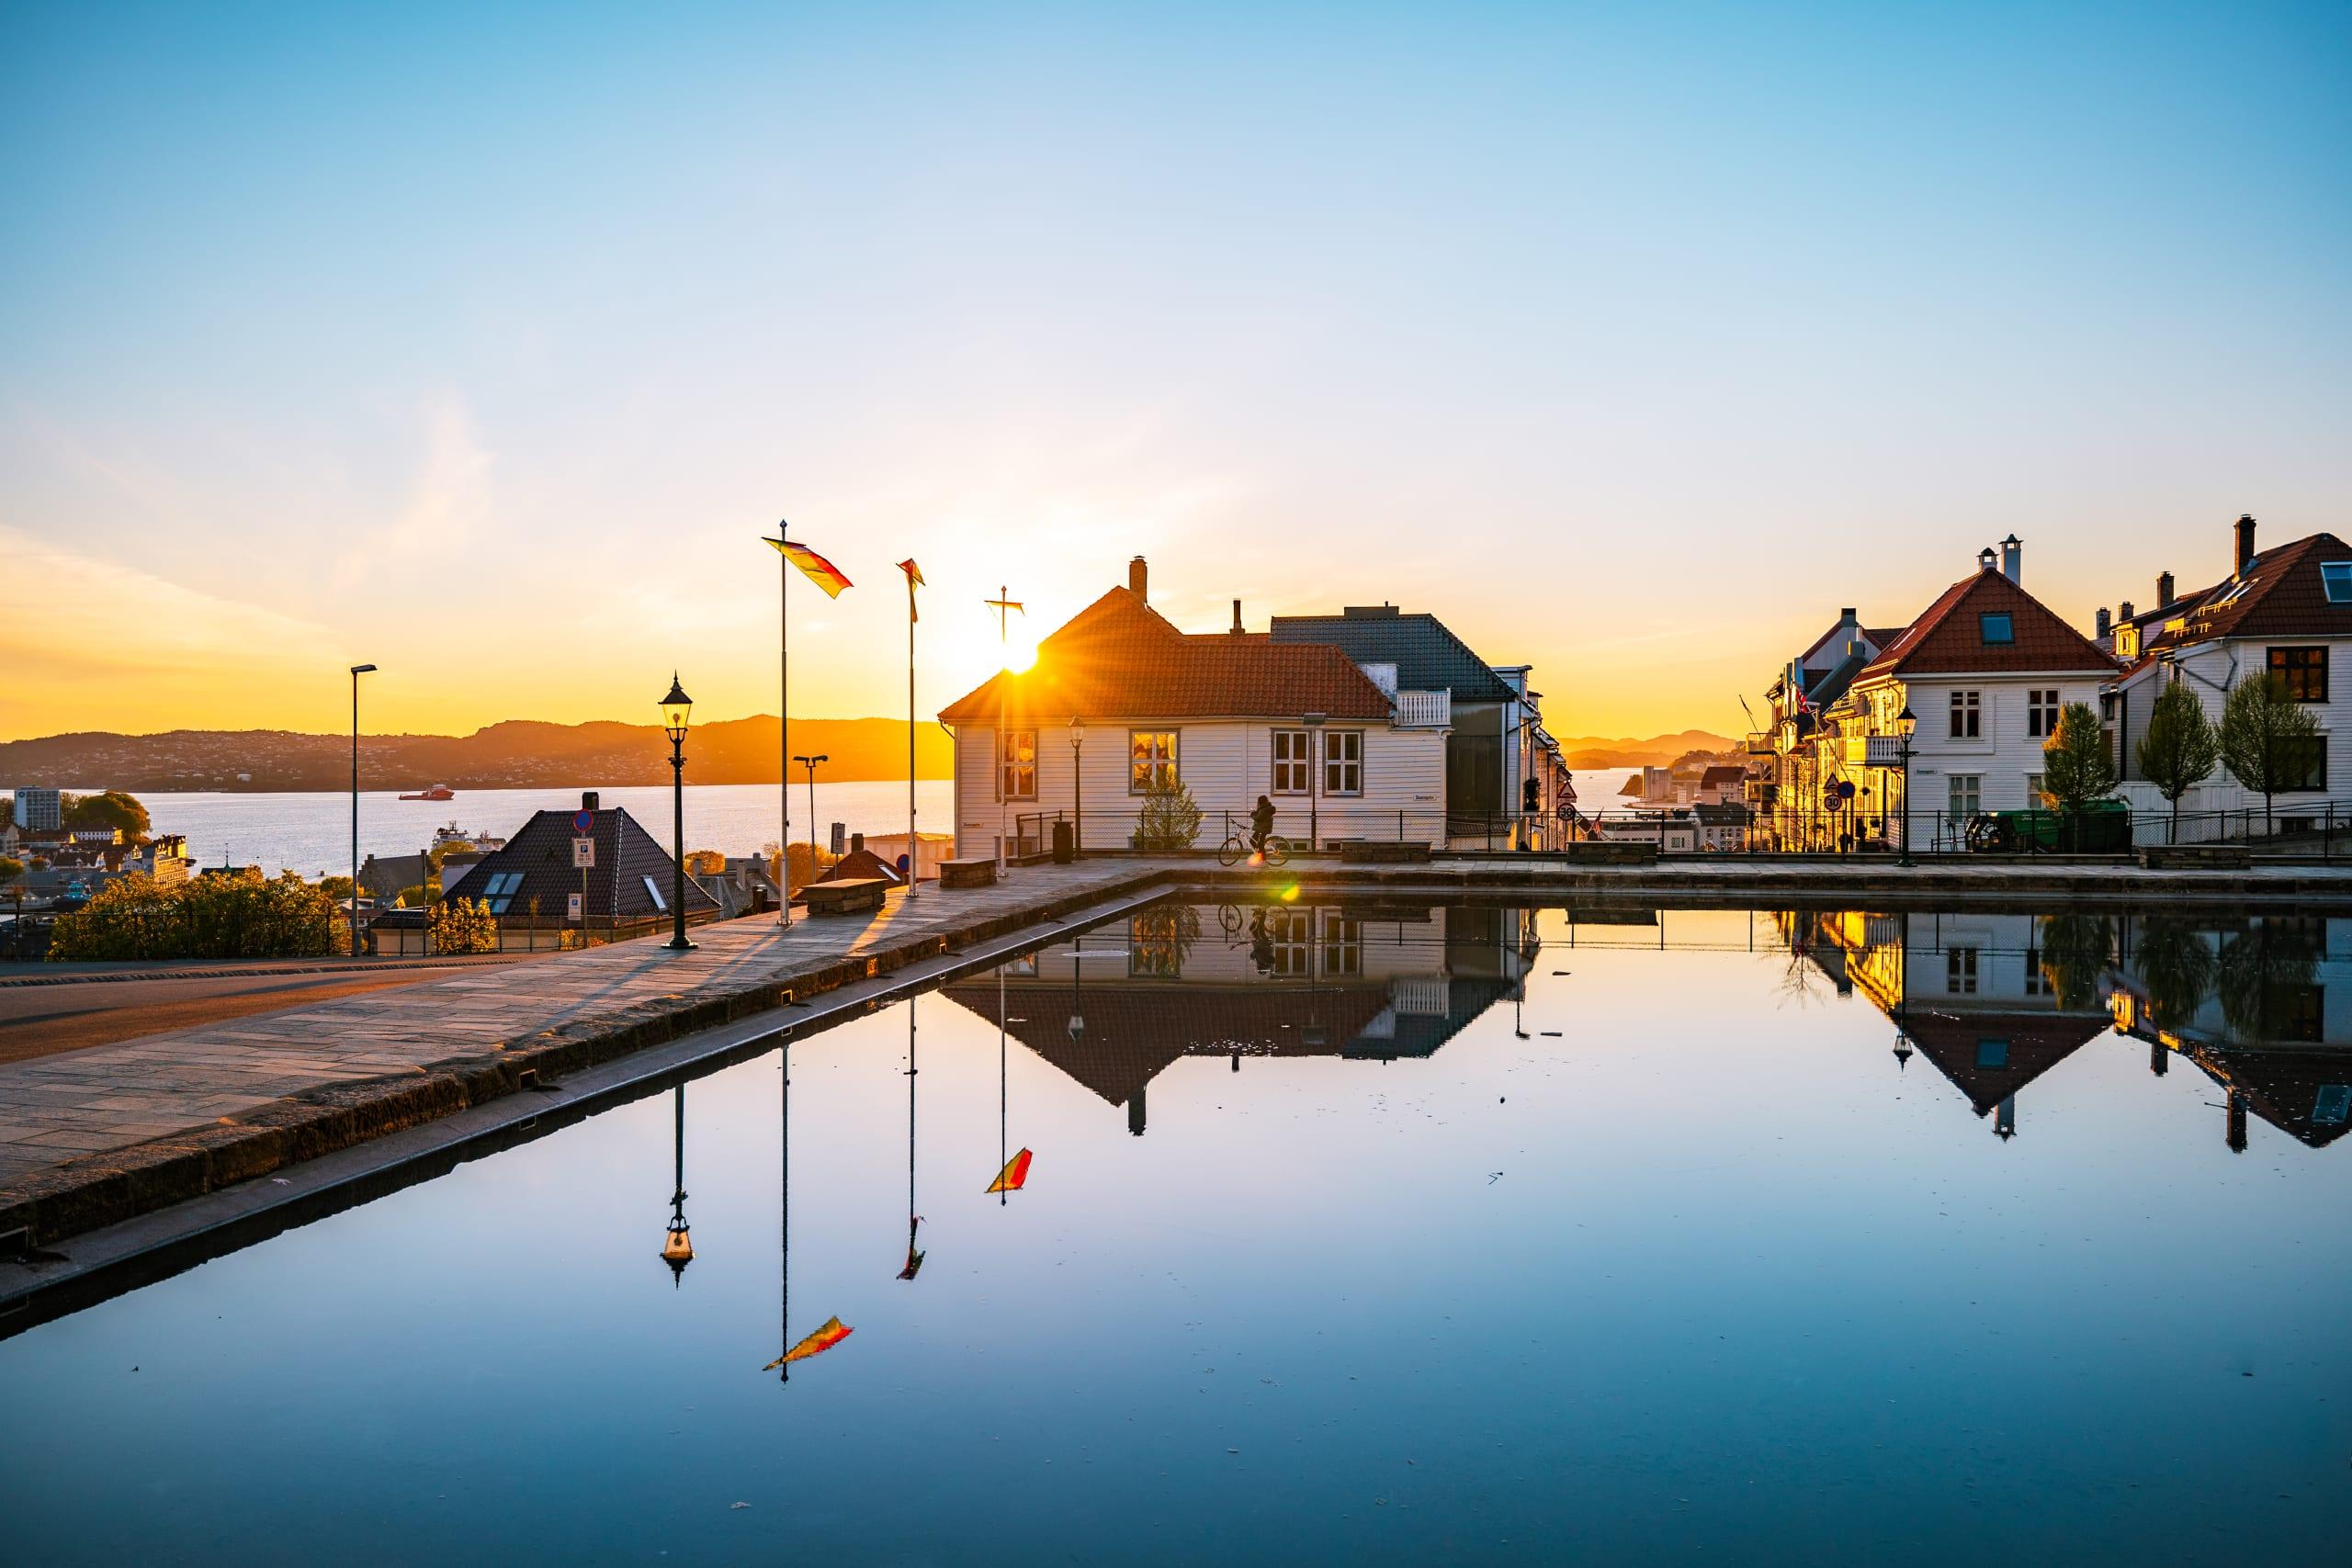 Sunset at Skansedammen pond in Sandviken Bergen